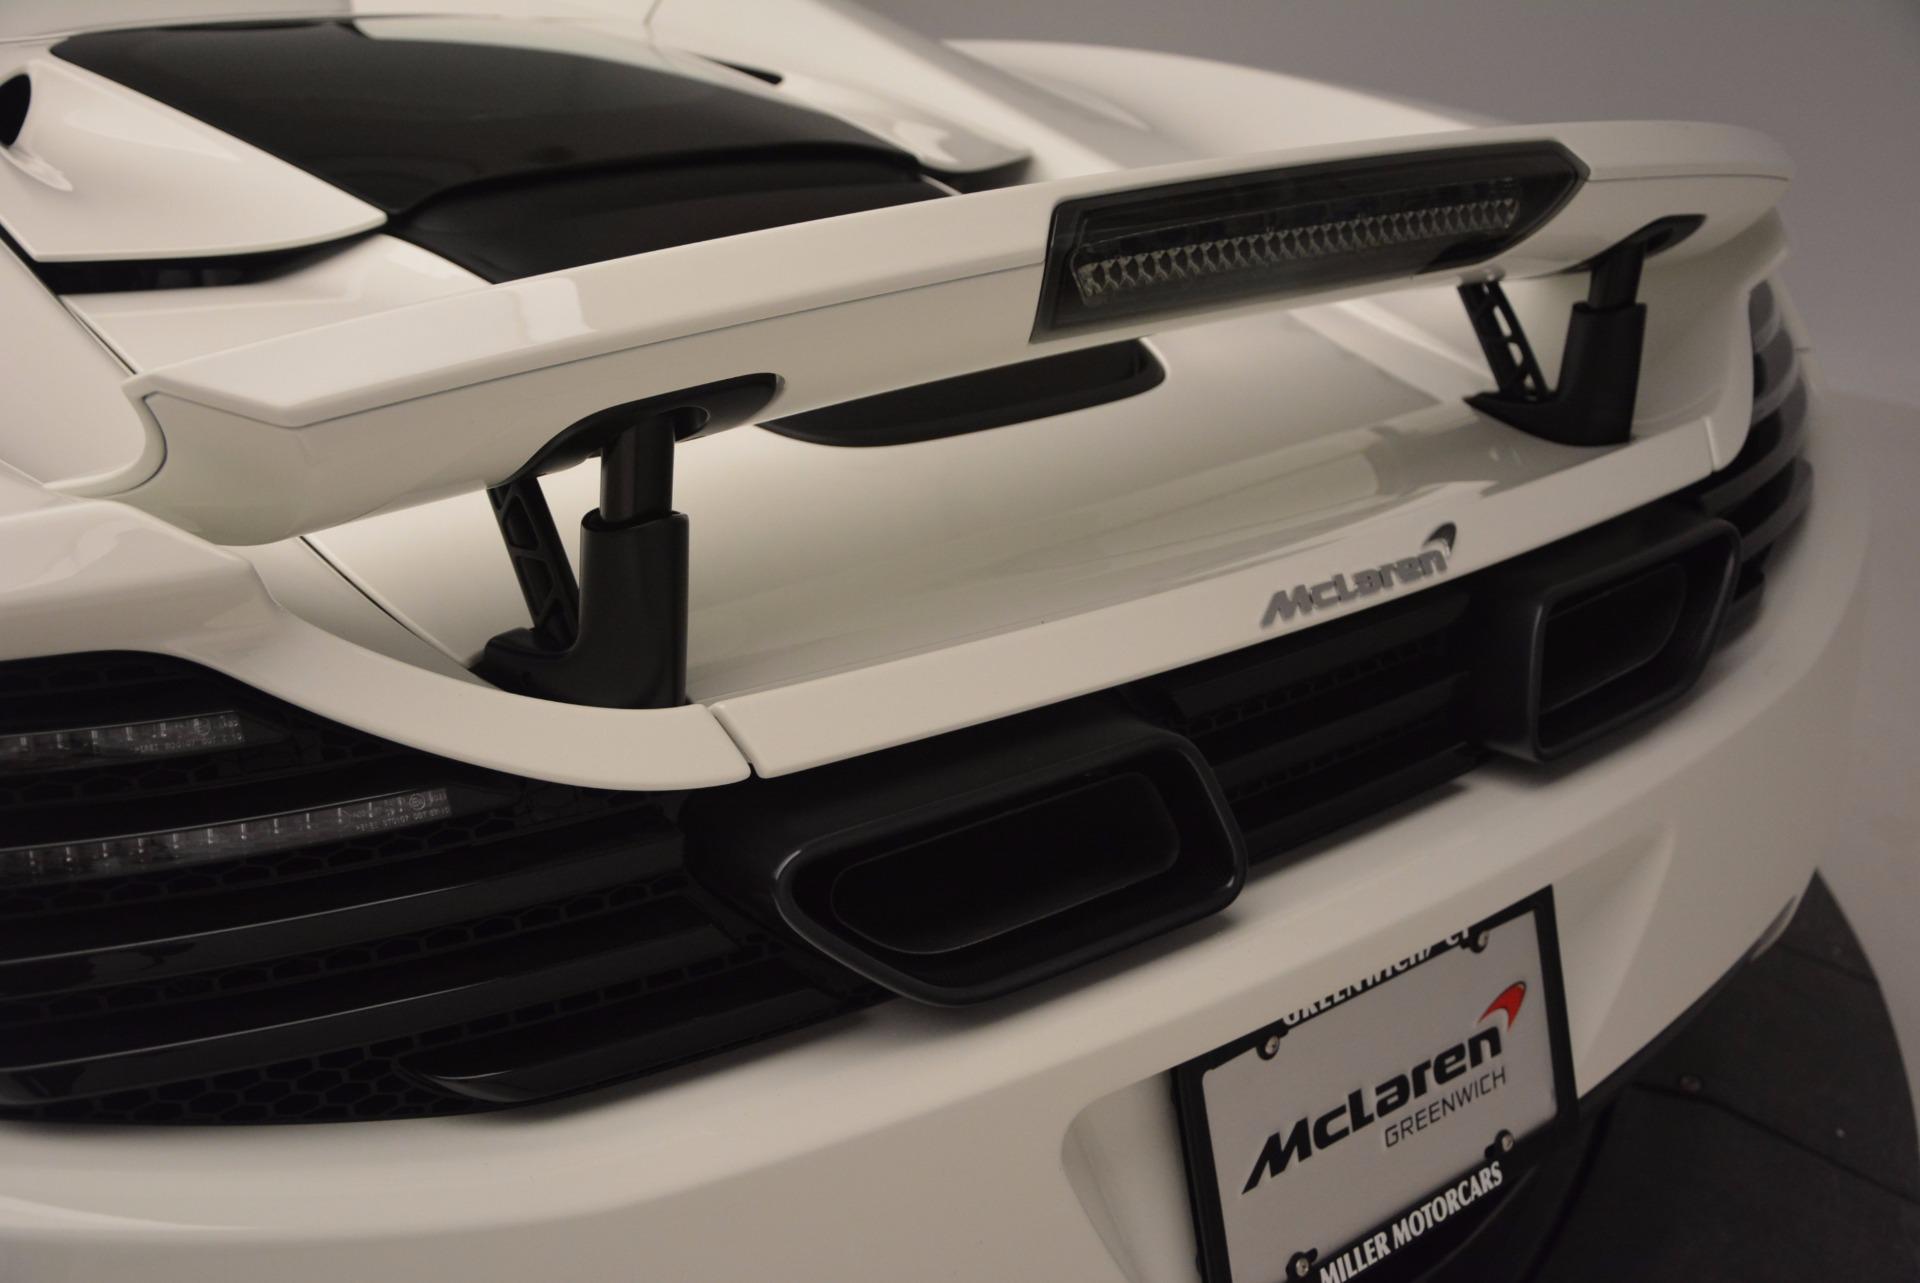 Used 2014 McLaren MP4-12C Spider For Sale In Westport, CT 908_p22